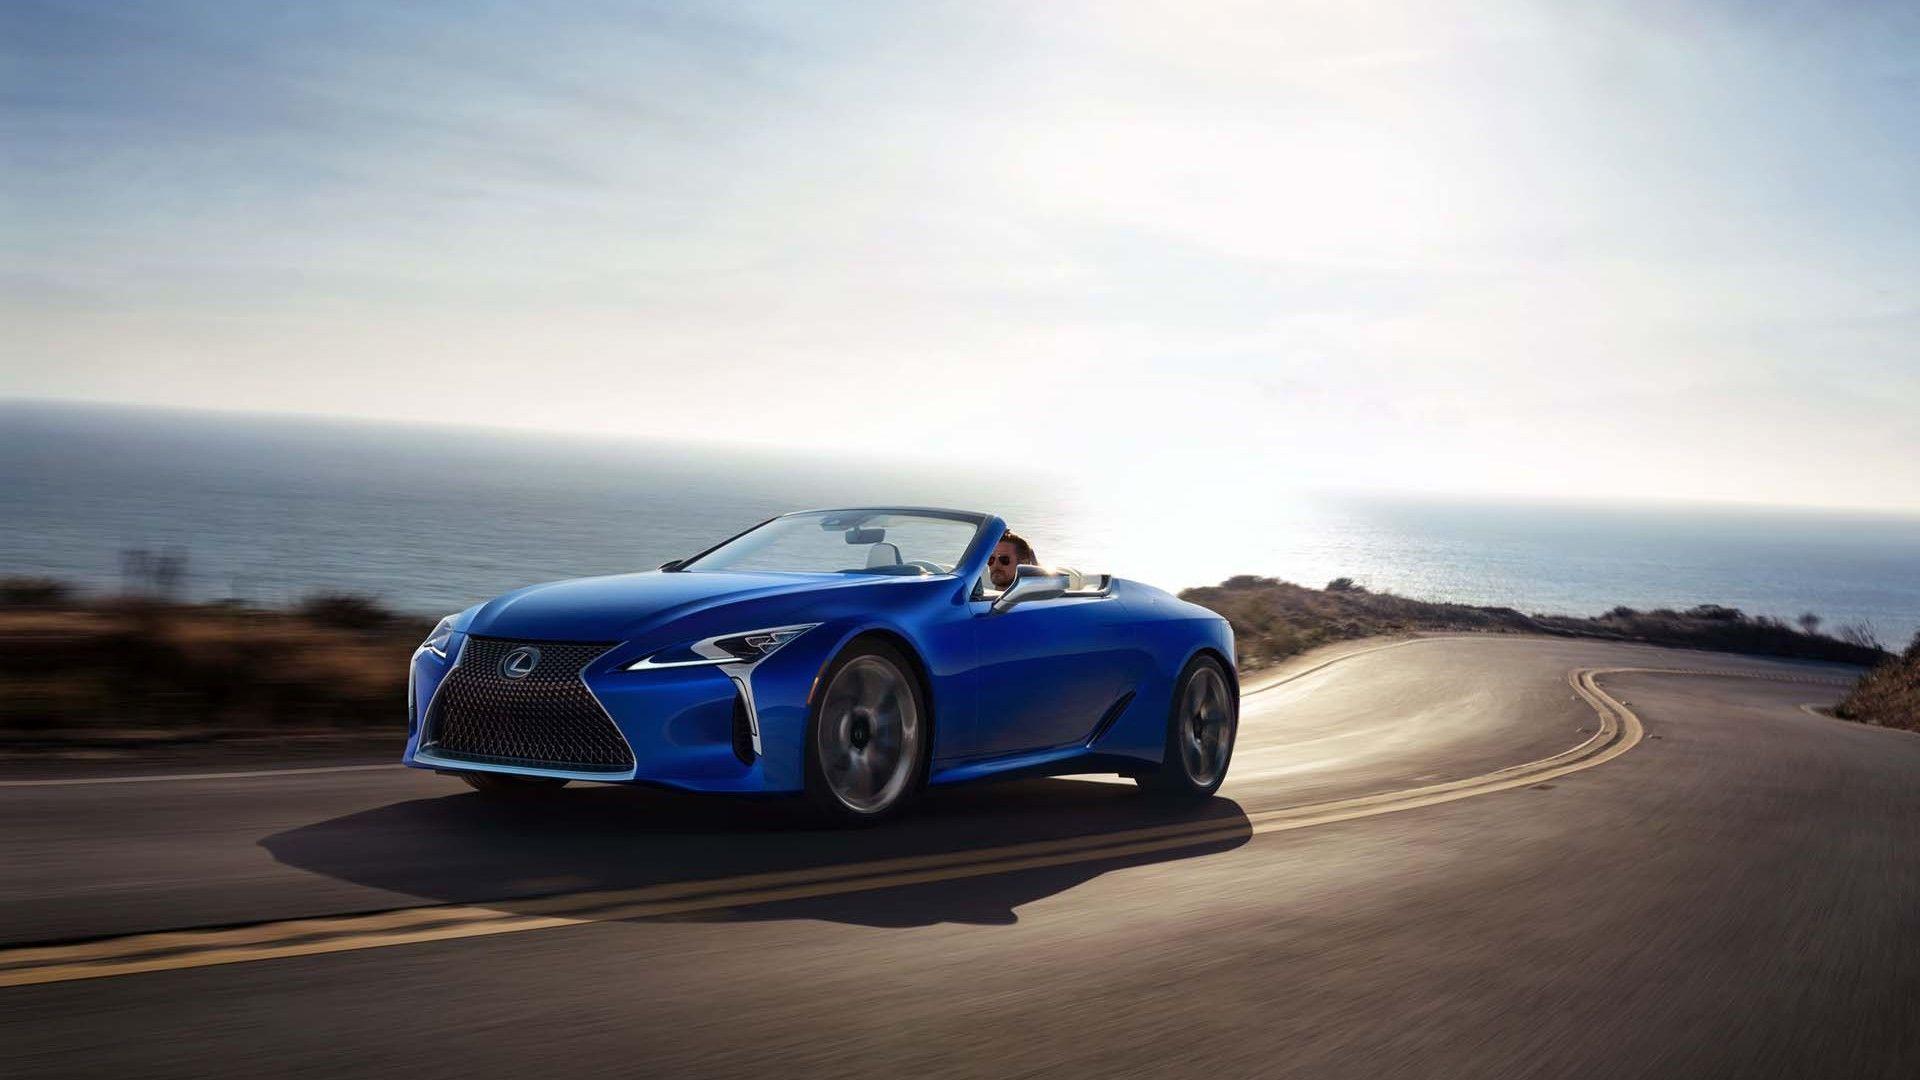 When Do 2021 Lexus Come Out New Evaluation When Do 2021 Lexus Come Out When Does The 2021 Lexus Nx Come Out Review When Do 2021 L In 2020 Lexus Lc Lexus Convertible